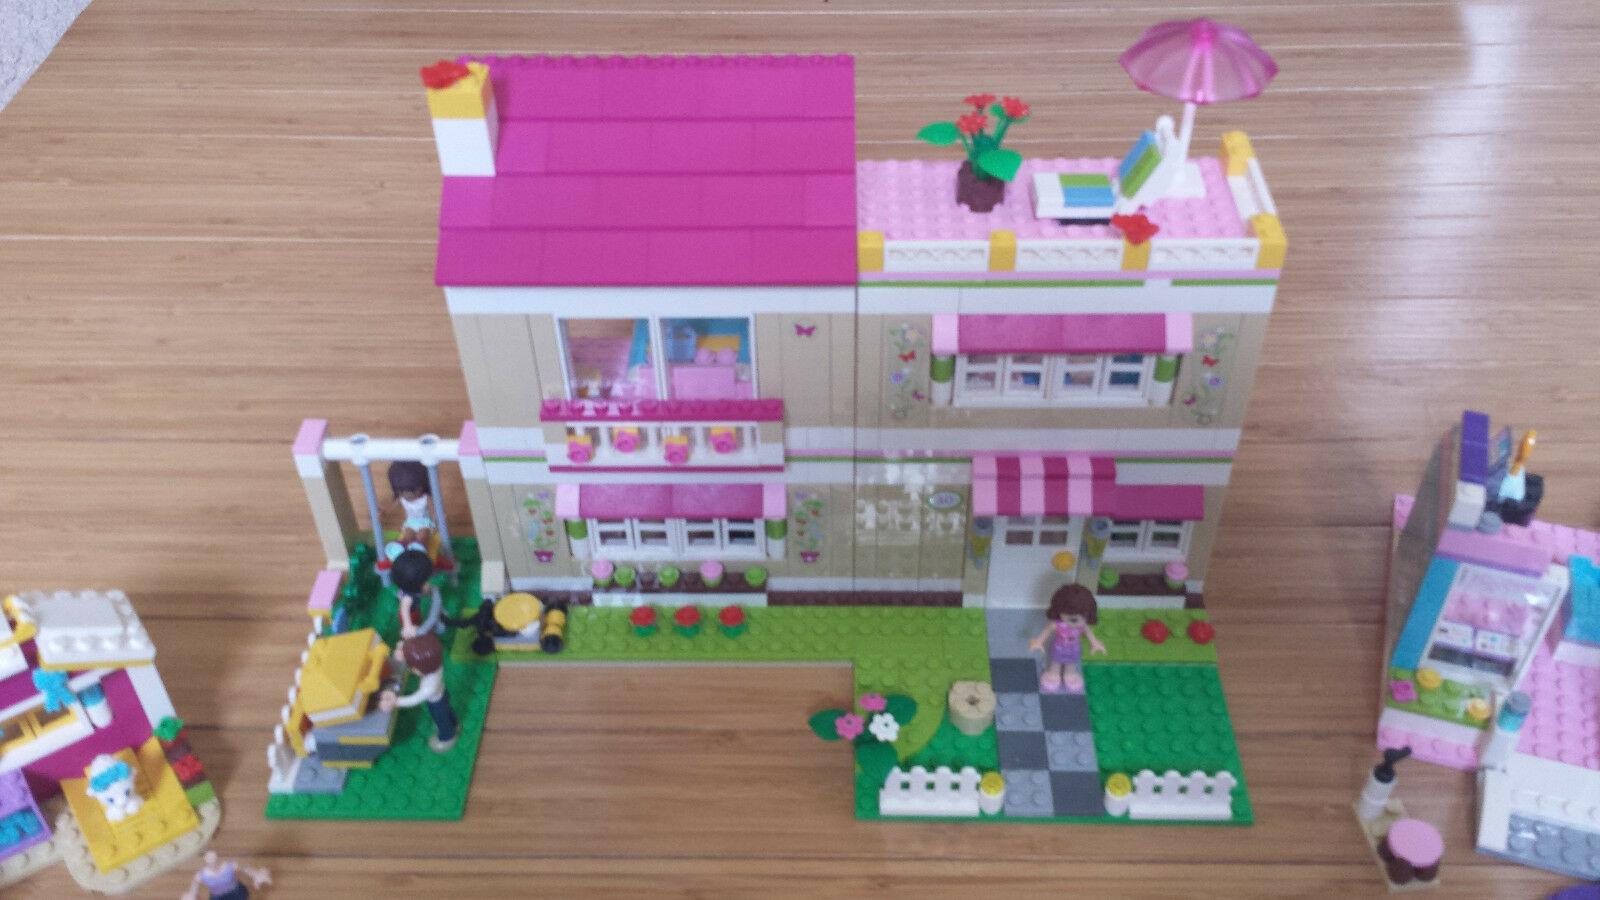 LEGO FRIENDS Olivia's  House Set  3315 - EXTRAS  derniers styles